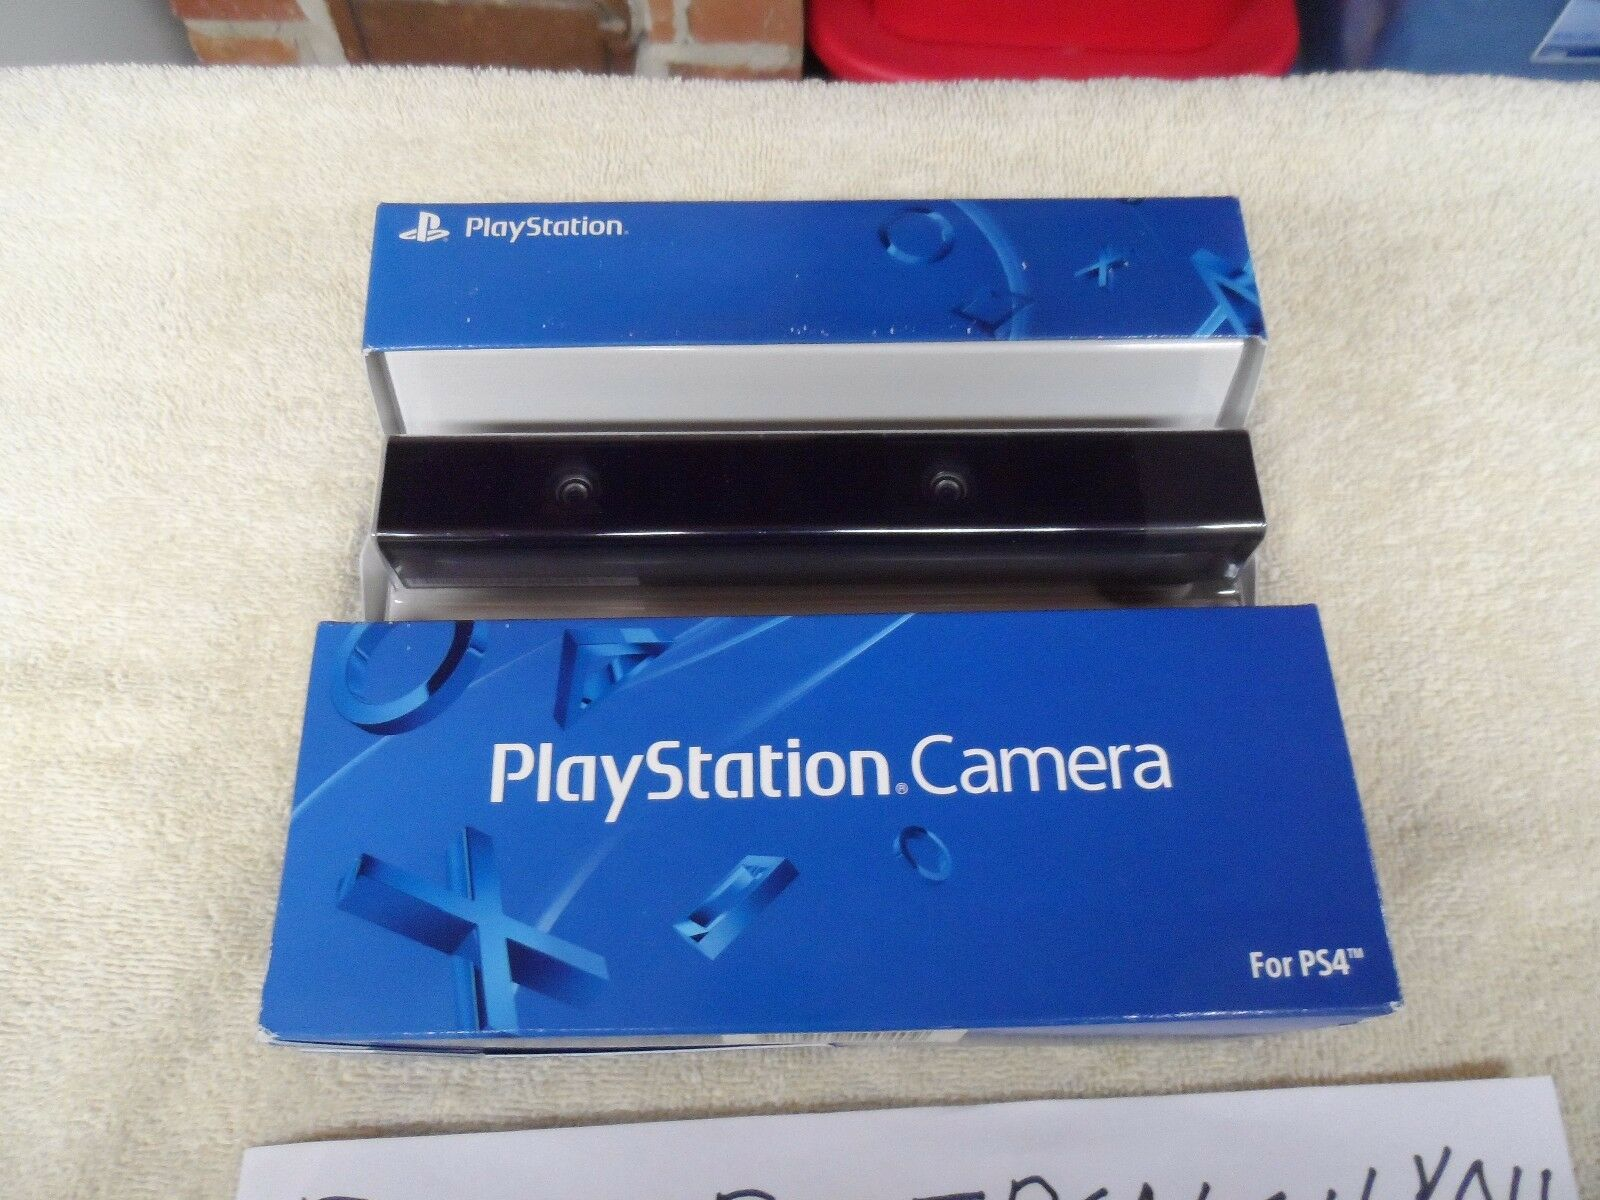 Playstation 4 Camera (Old Model) 9